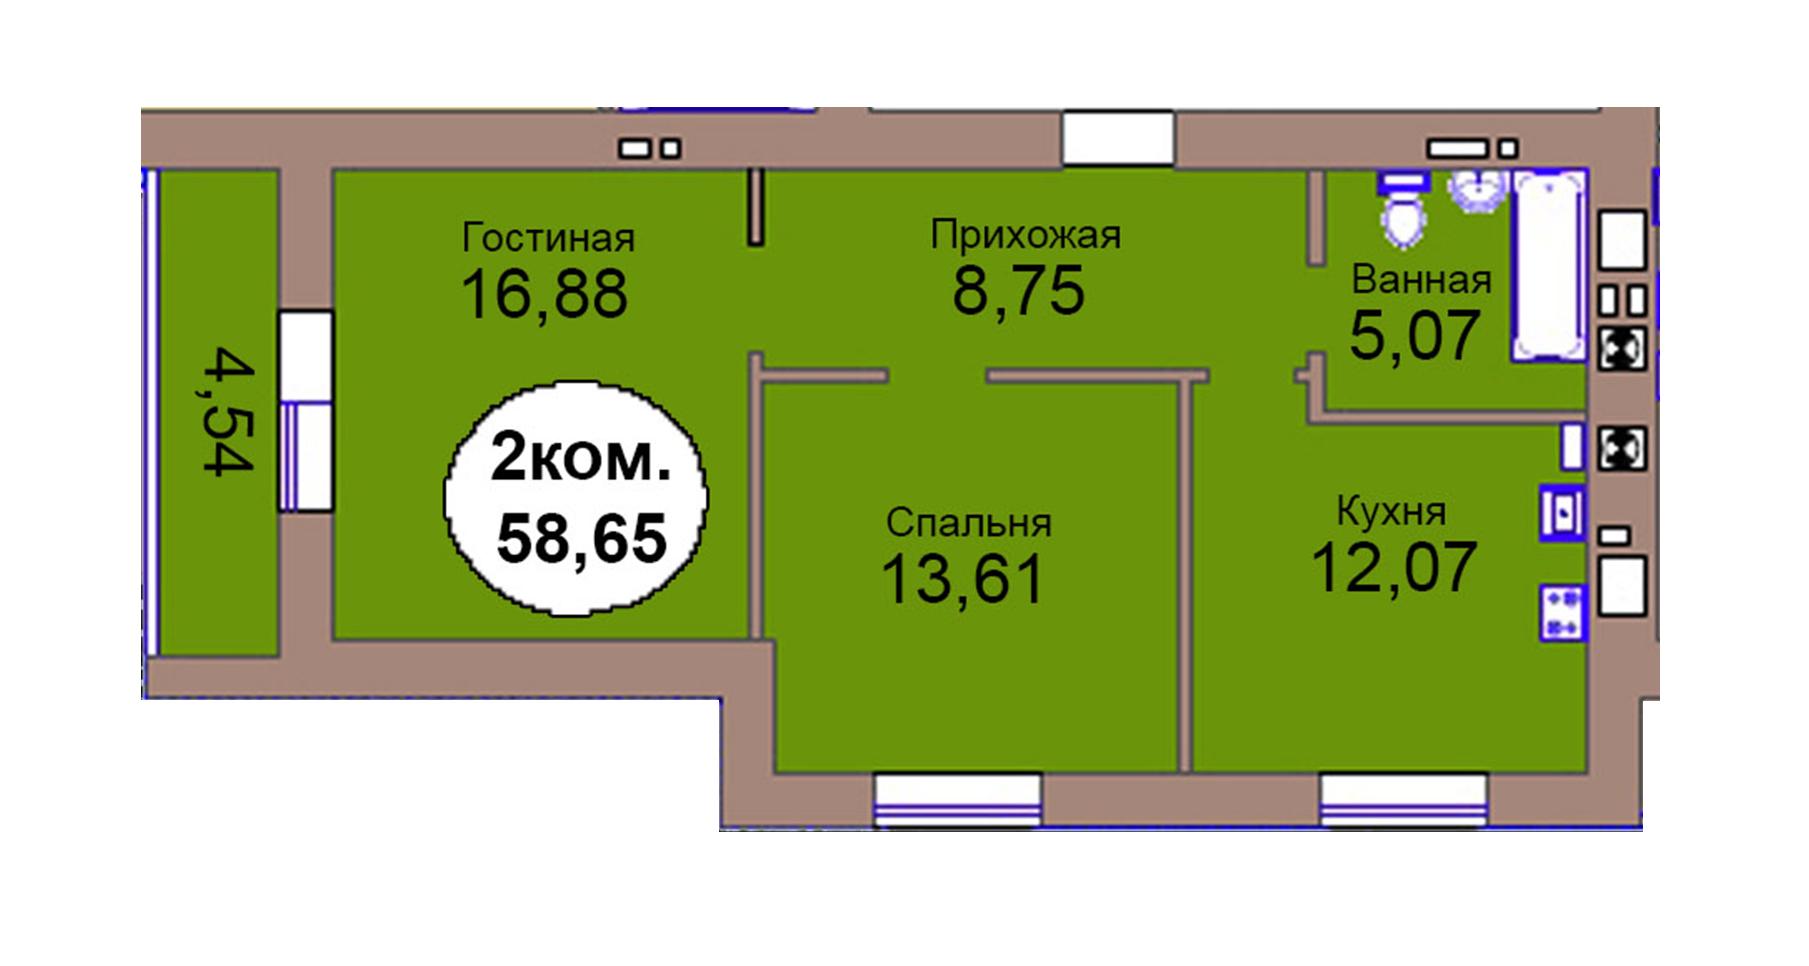 2-комн. кв. по пер. Калининградский, 4  кв. 134 в Калининграде